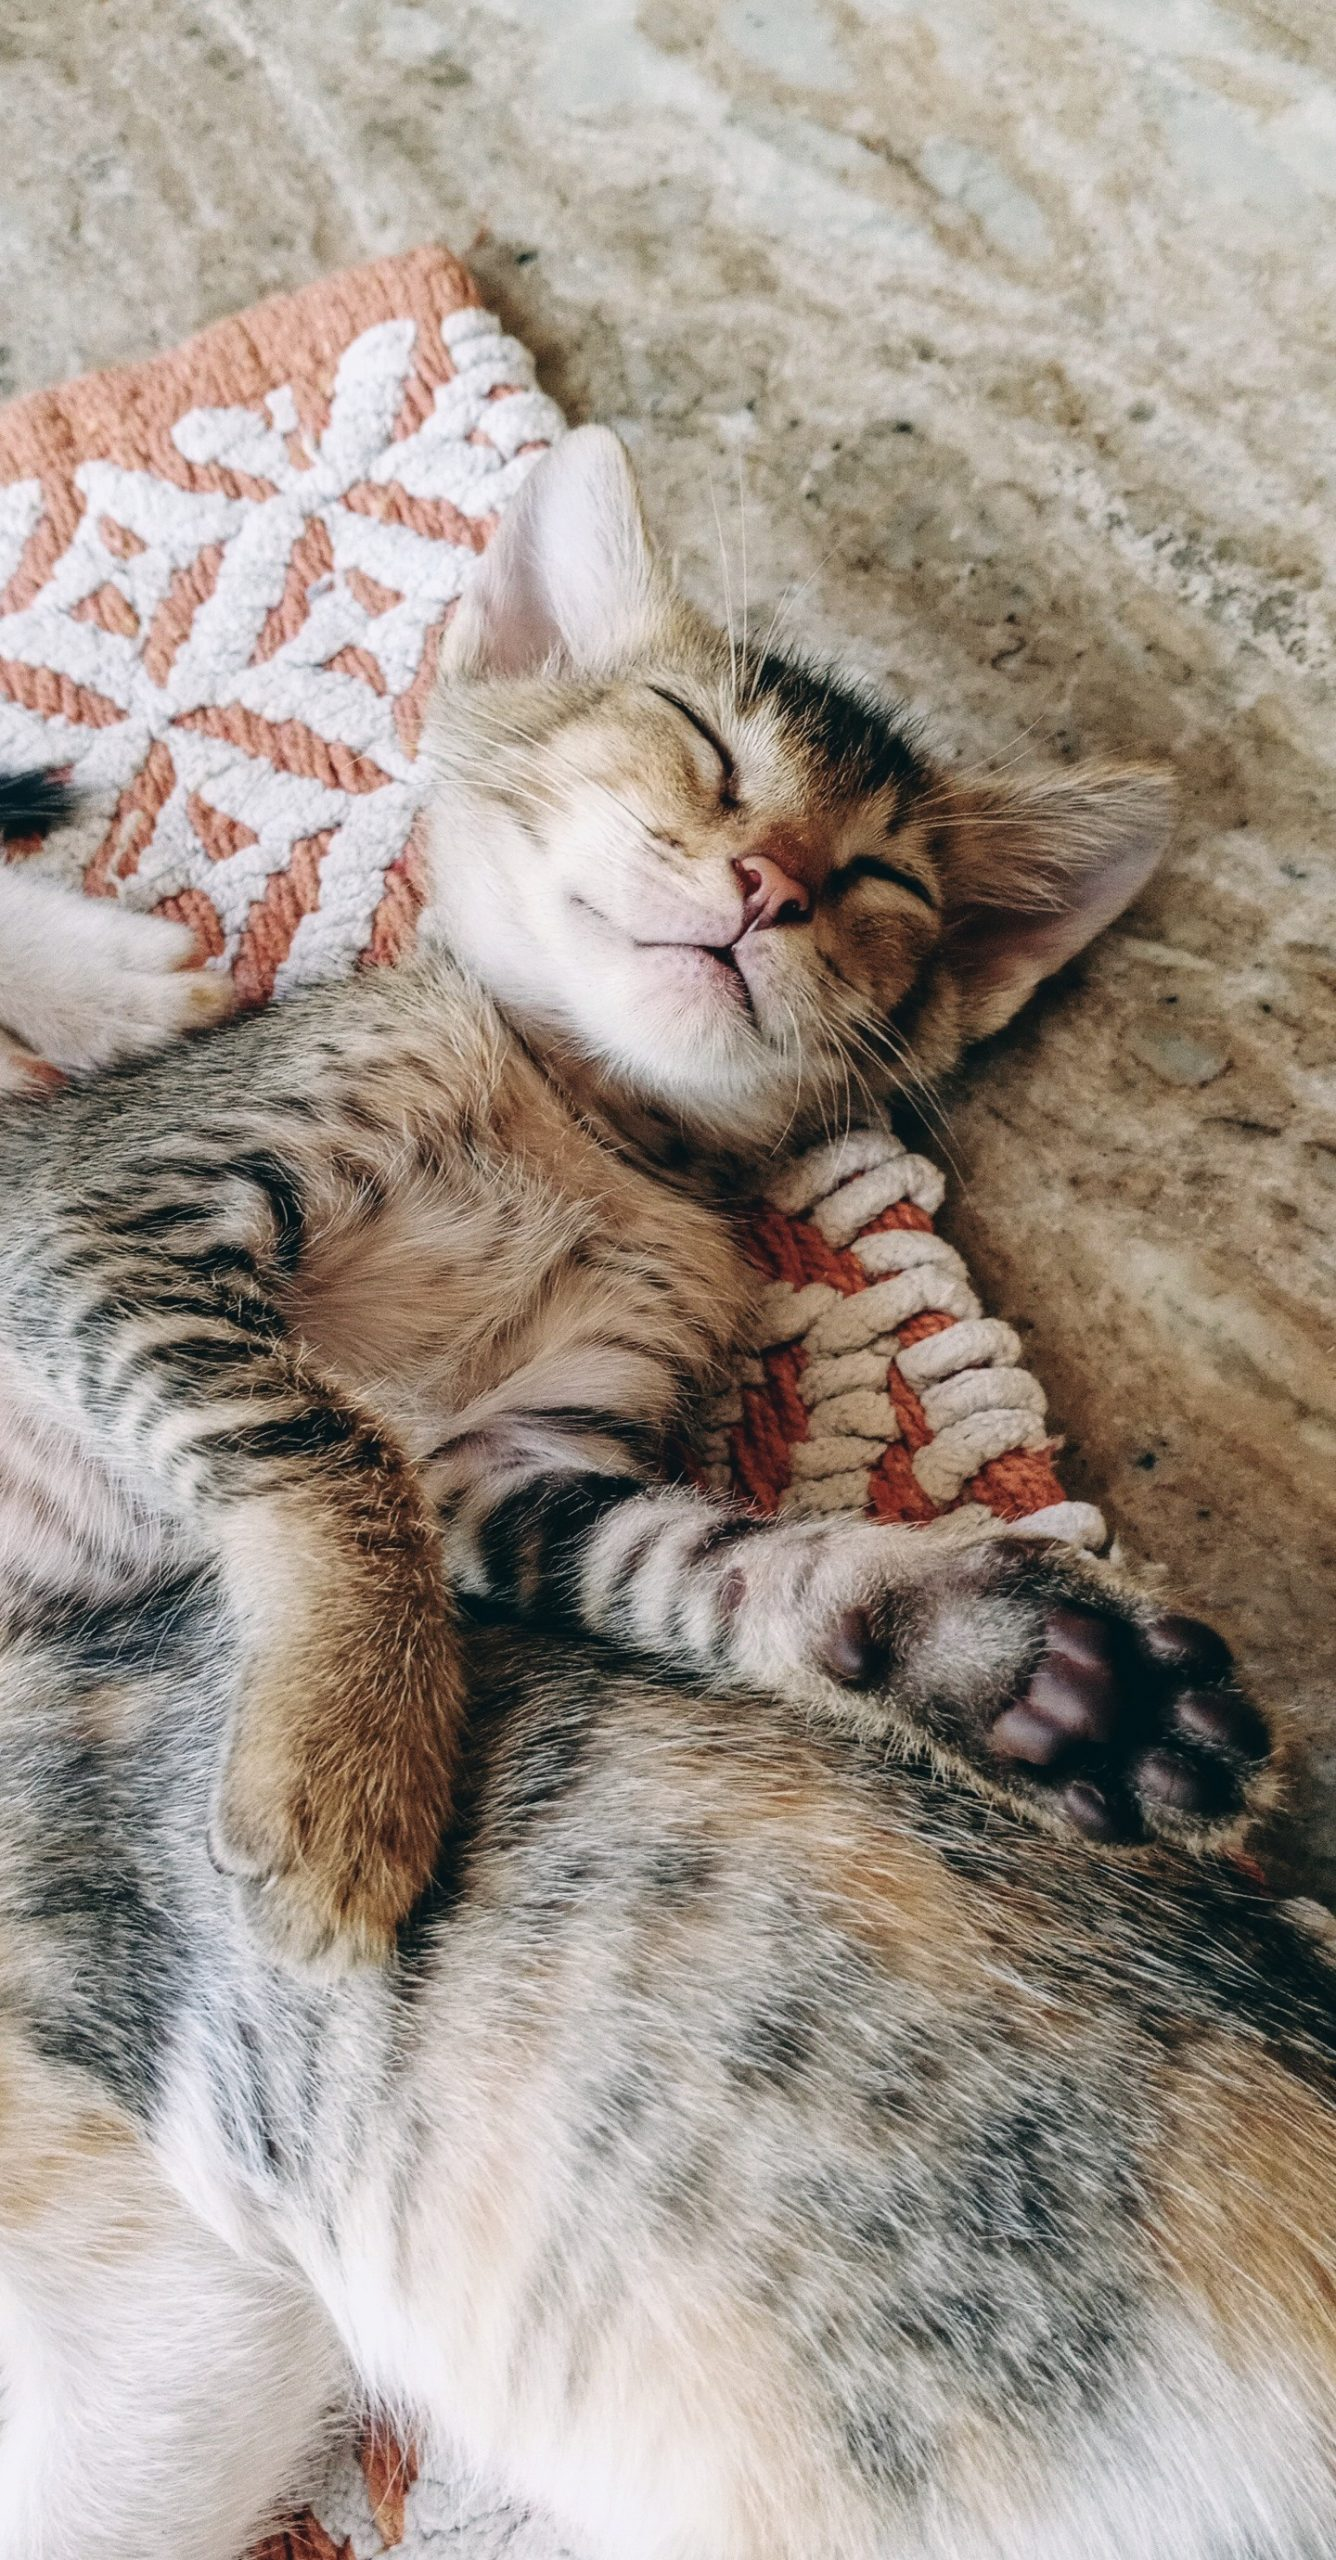 Baby Tabby Cat Sleeping